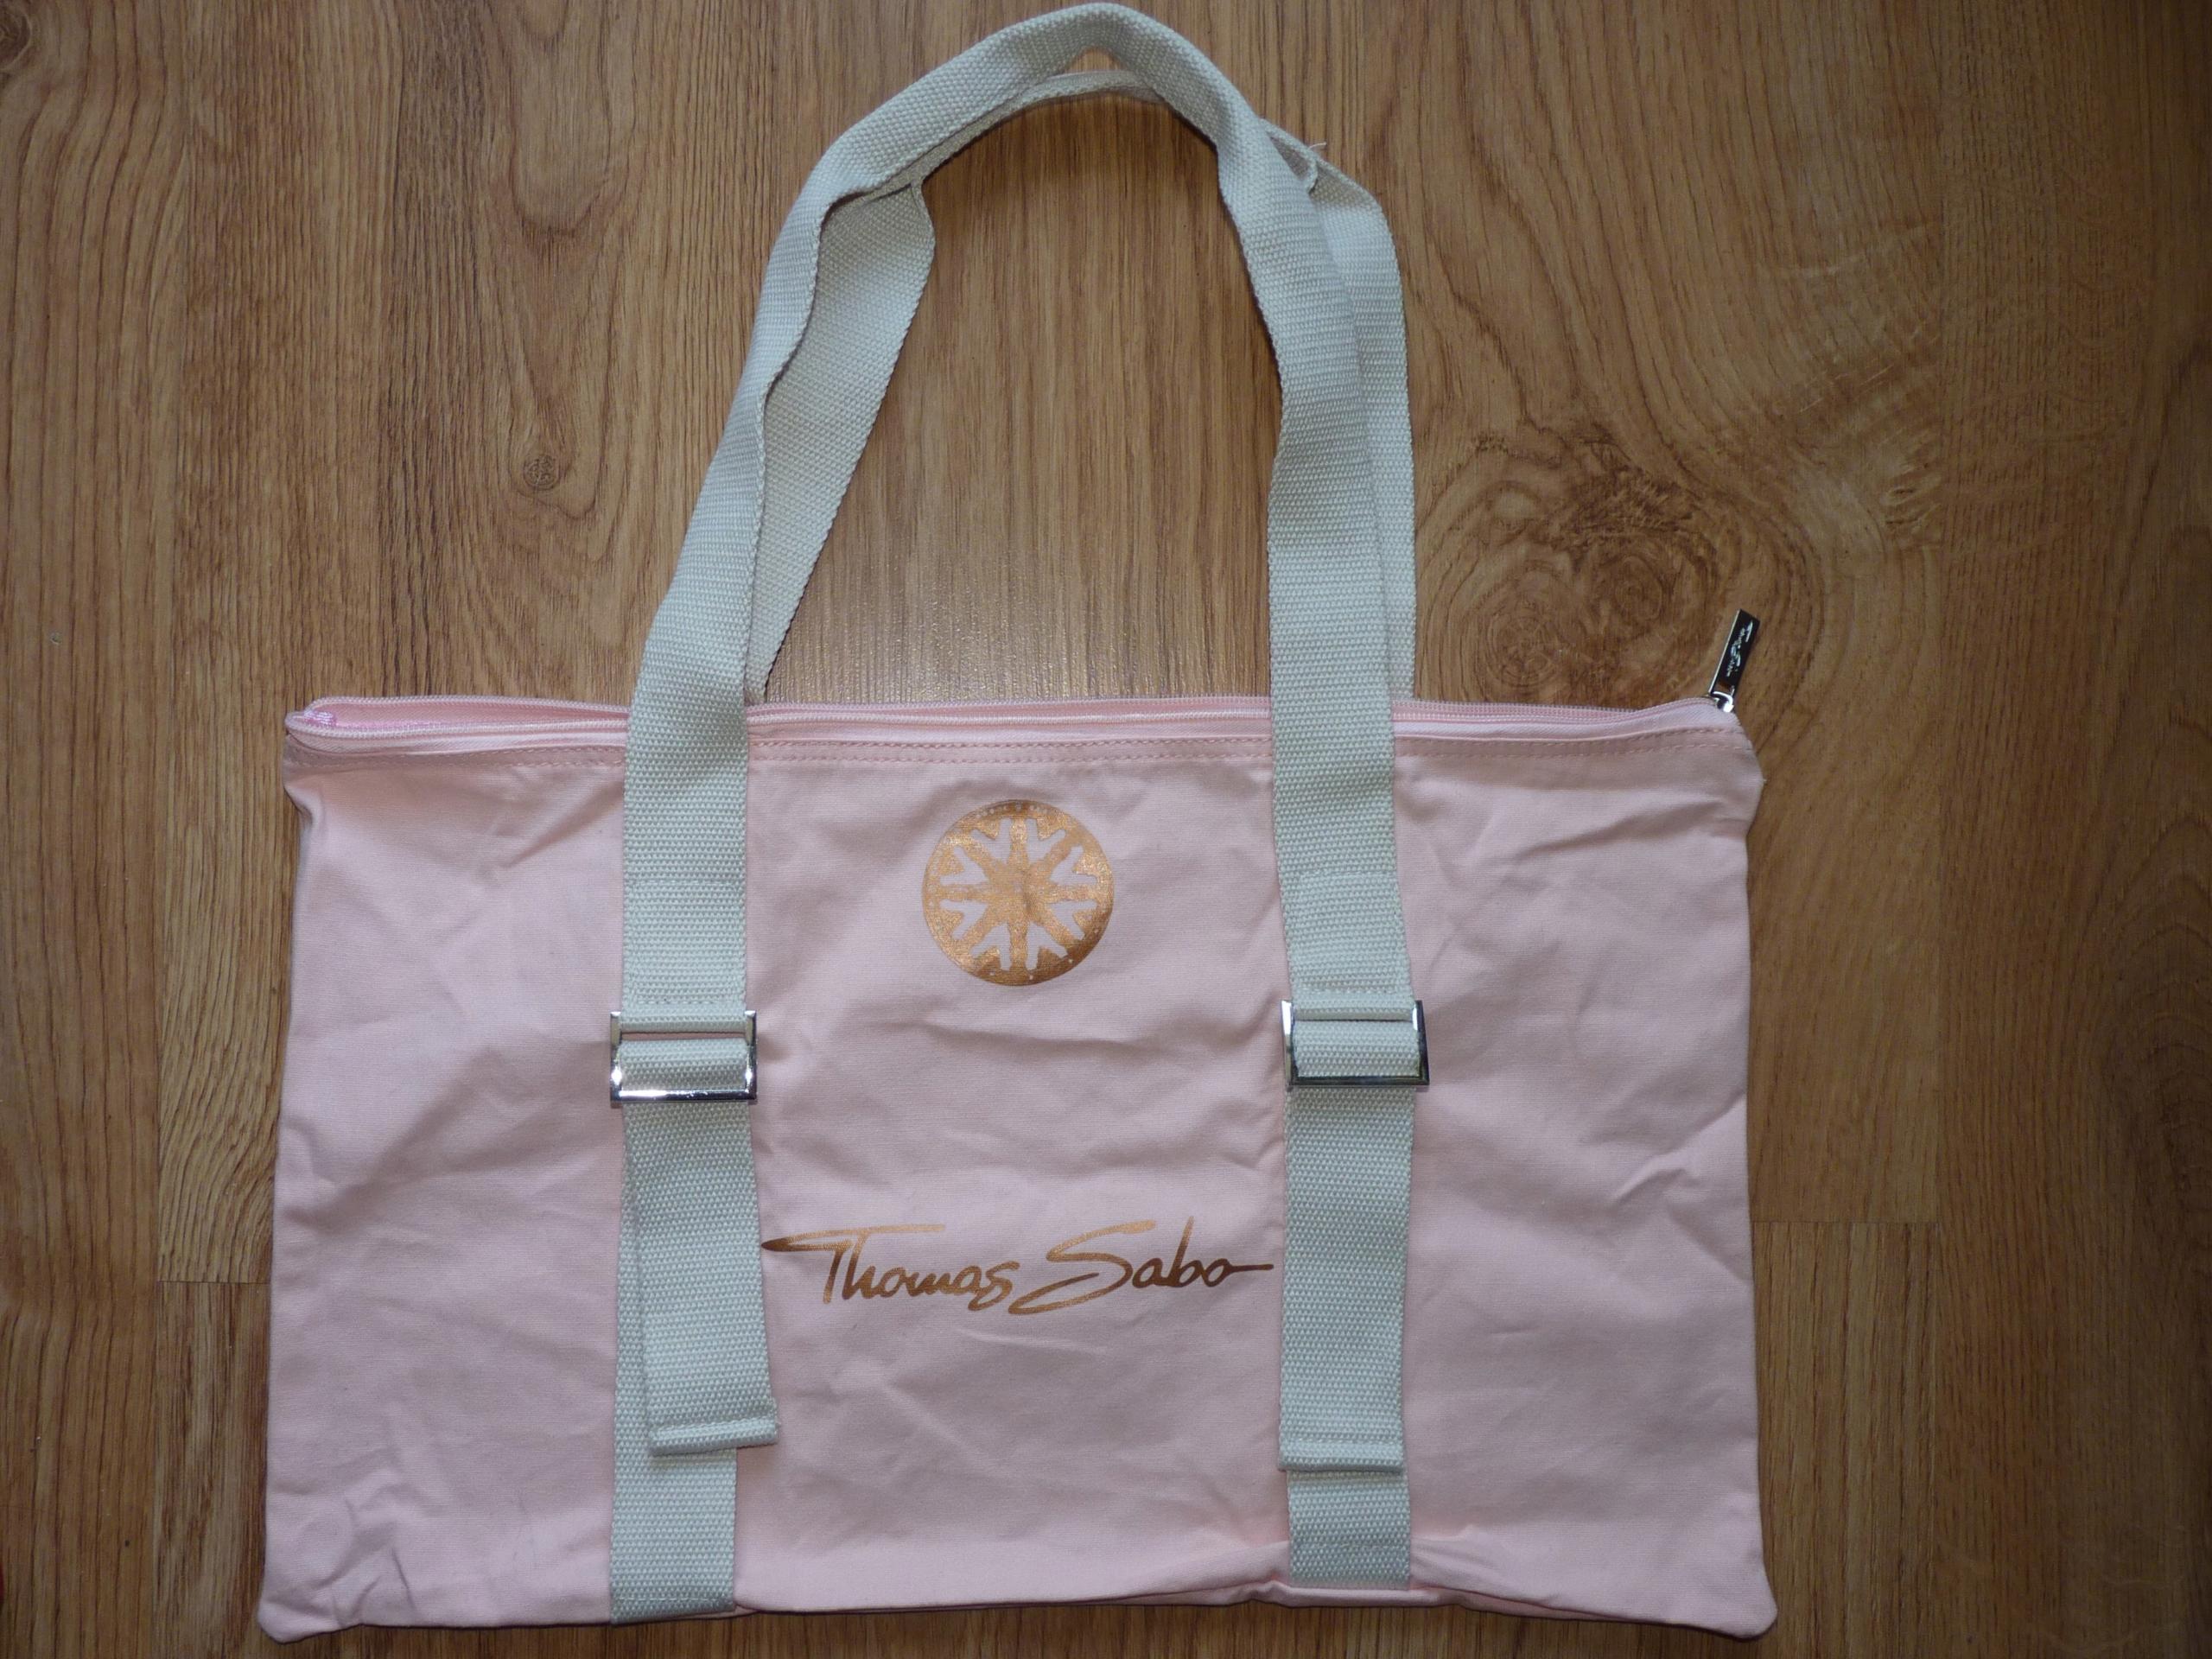 10477ca3125ce THOMAS SABO torebka torba JOGA FITNESS Shopper Bag 7605775517 - Allegro.pl